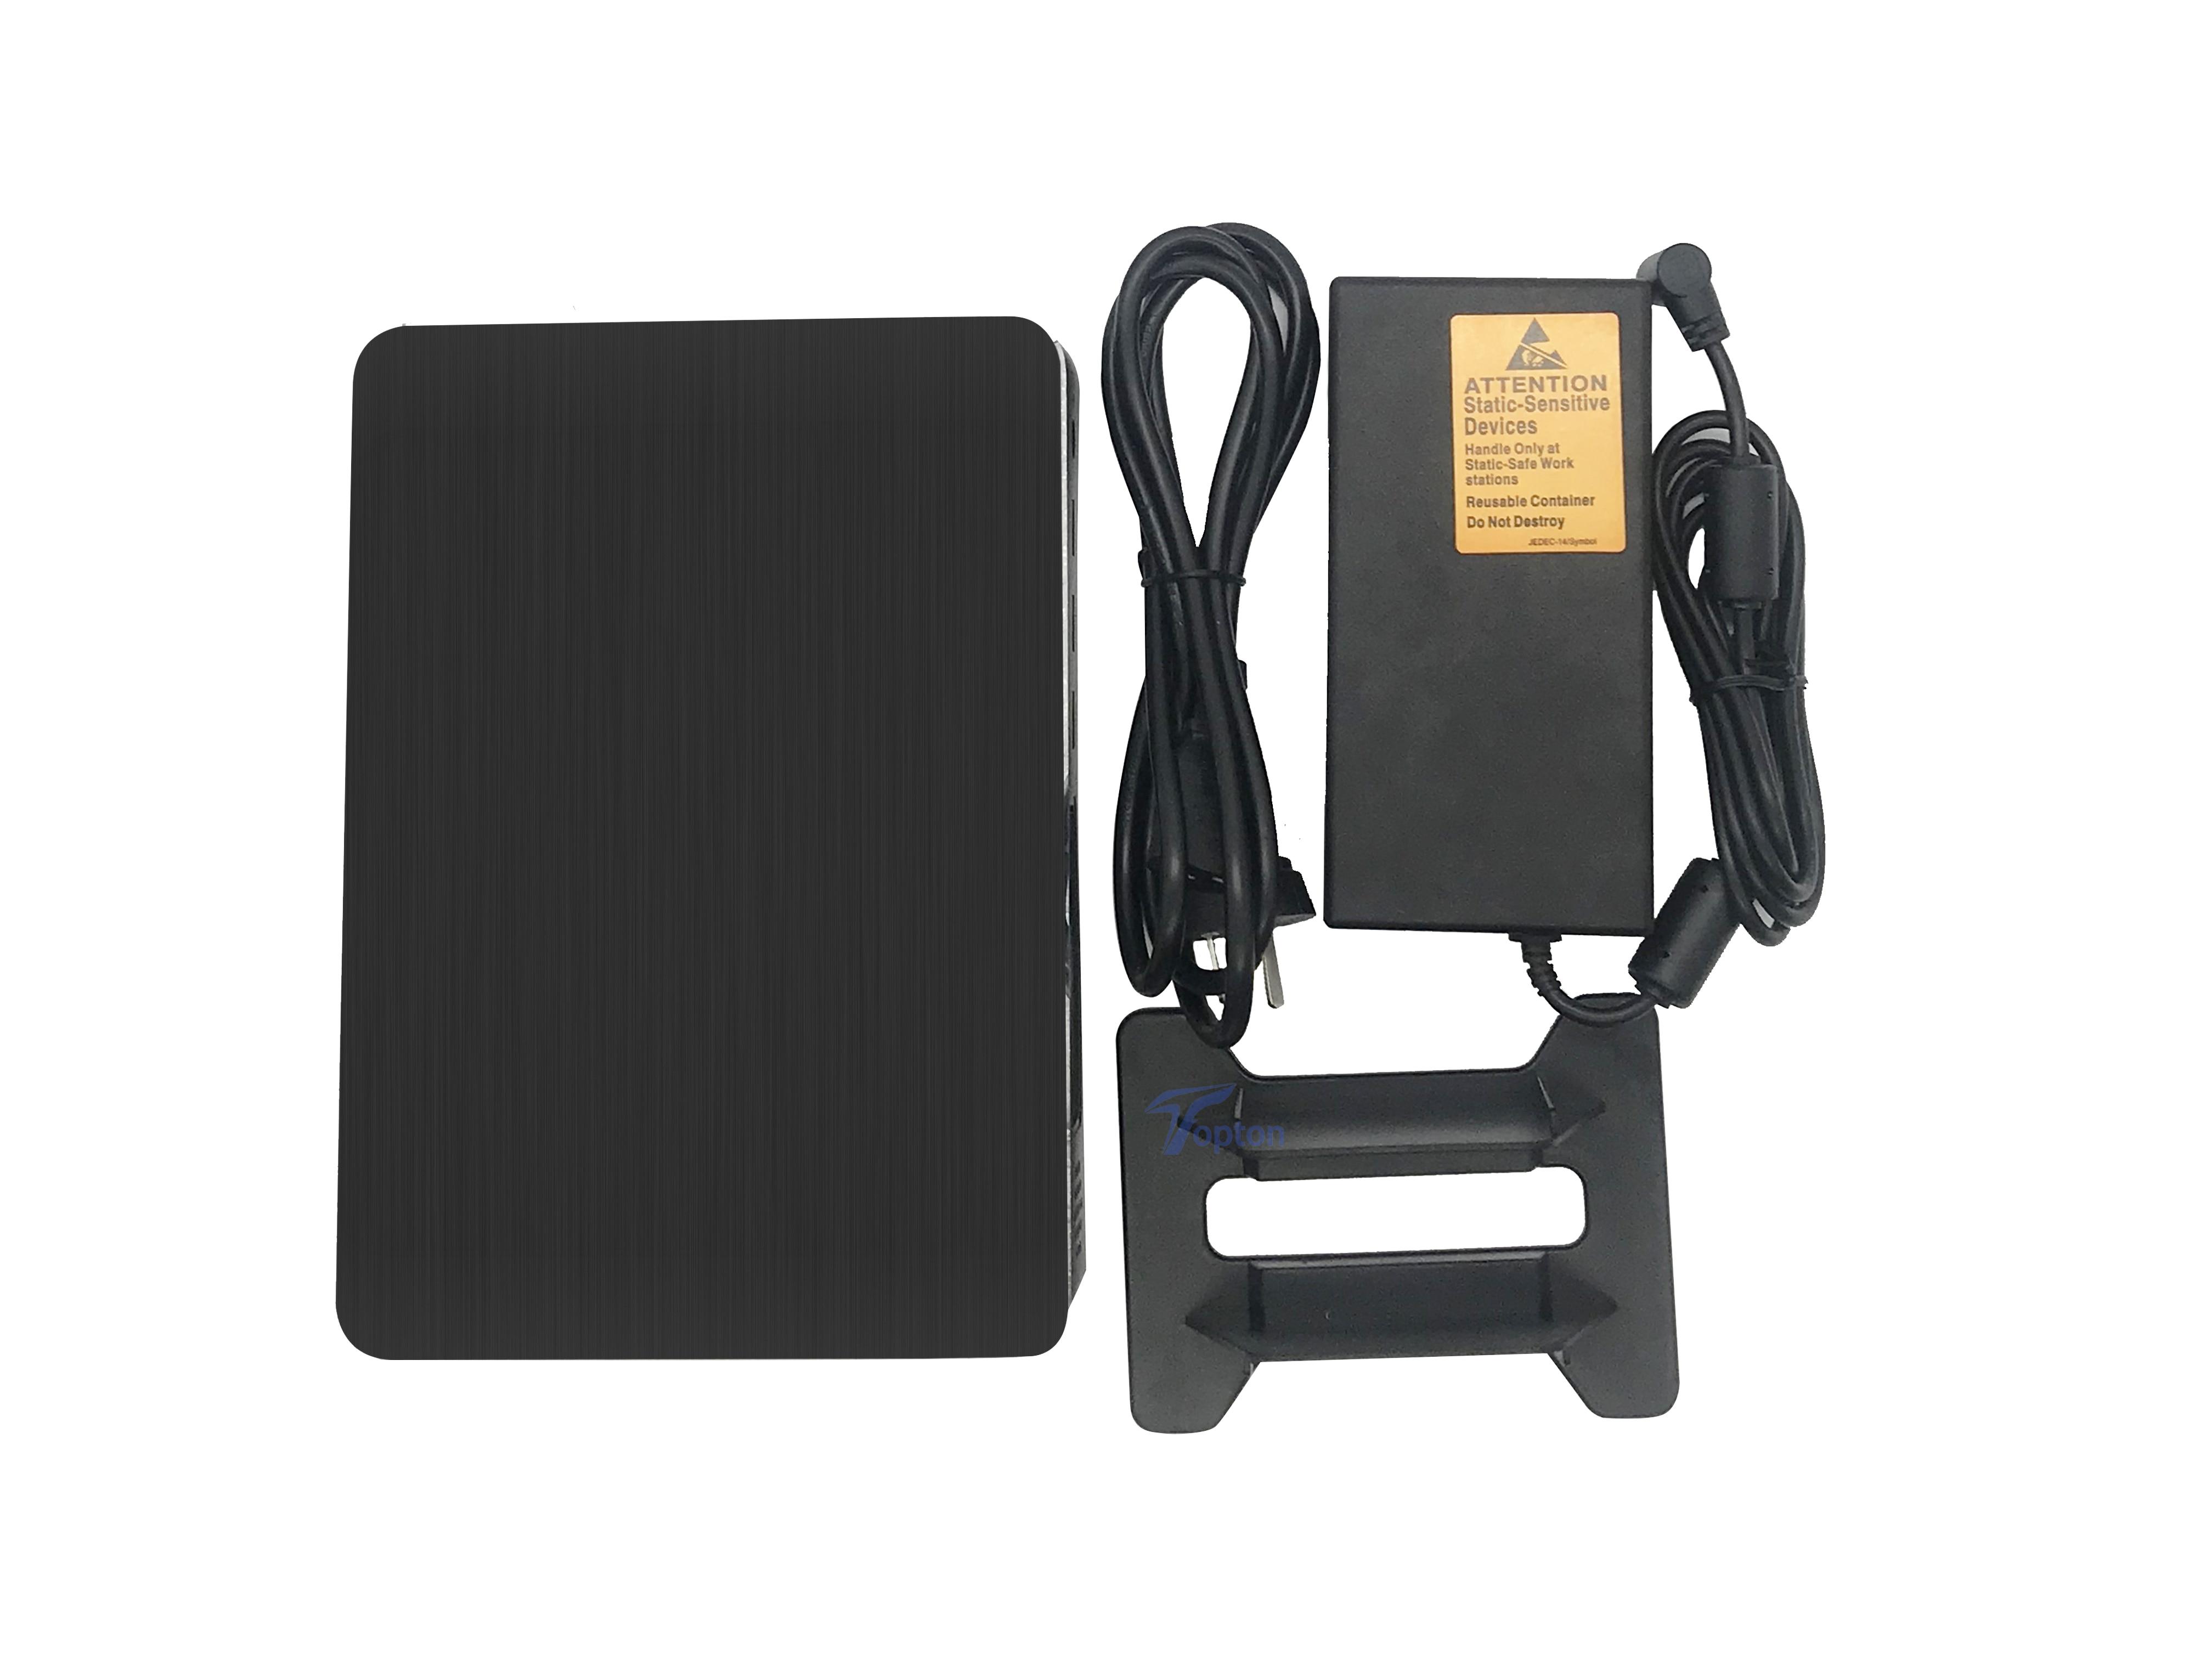 Image 5 - كمبيوتر ألعاب حاسوب شخصي مكتبي النواة i9 9900 i7 9700 i5 9400F GTX 1650 4GB 2 * DDR4 ويندوز البسيطة PC M.2 NVMe HDMI2.0 4K لعبة PC AC WiFiكمبيوتر شخصي صغير   -